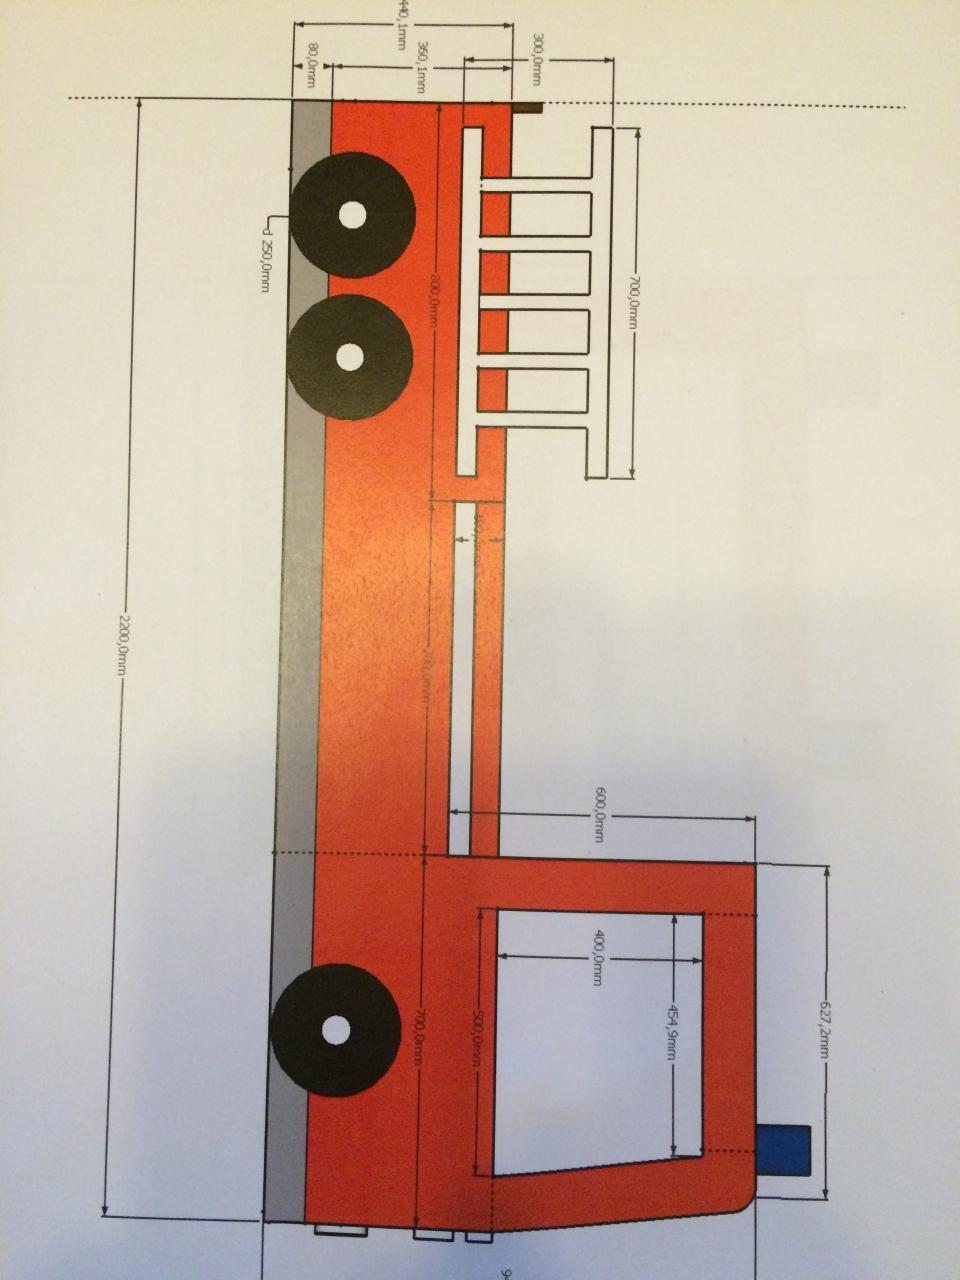 Feuerwehrbett Bauanleitung Zum Selberbauen 1 2 Do Com